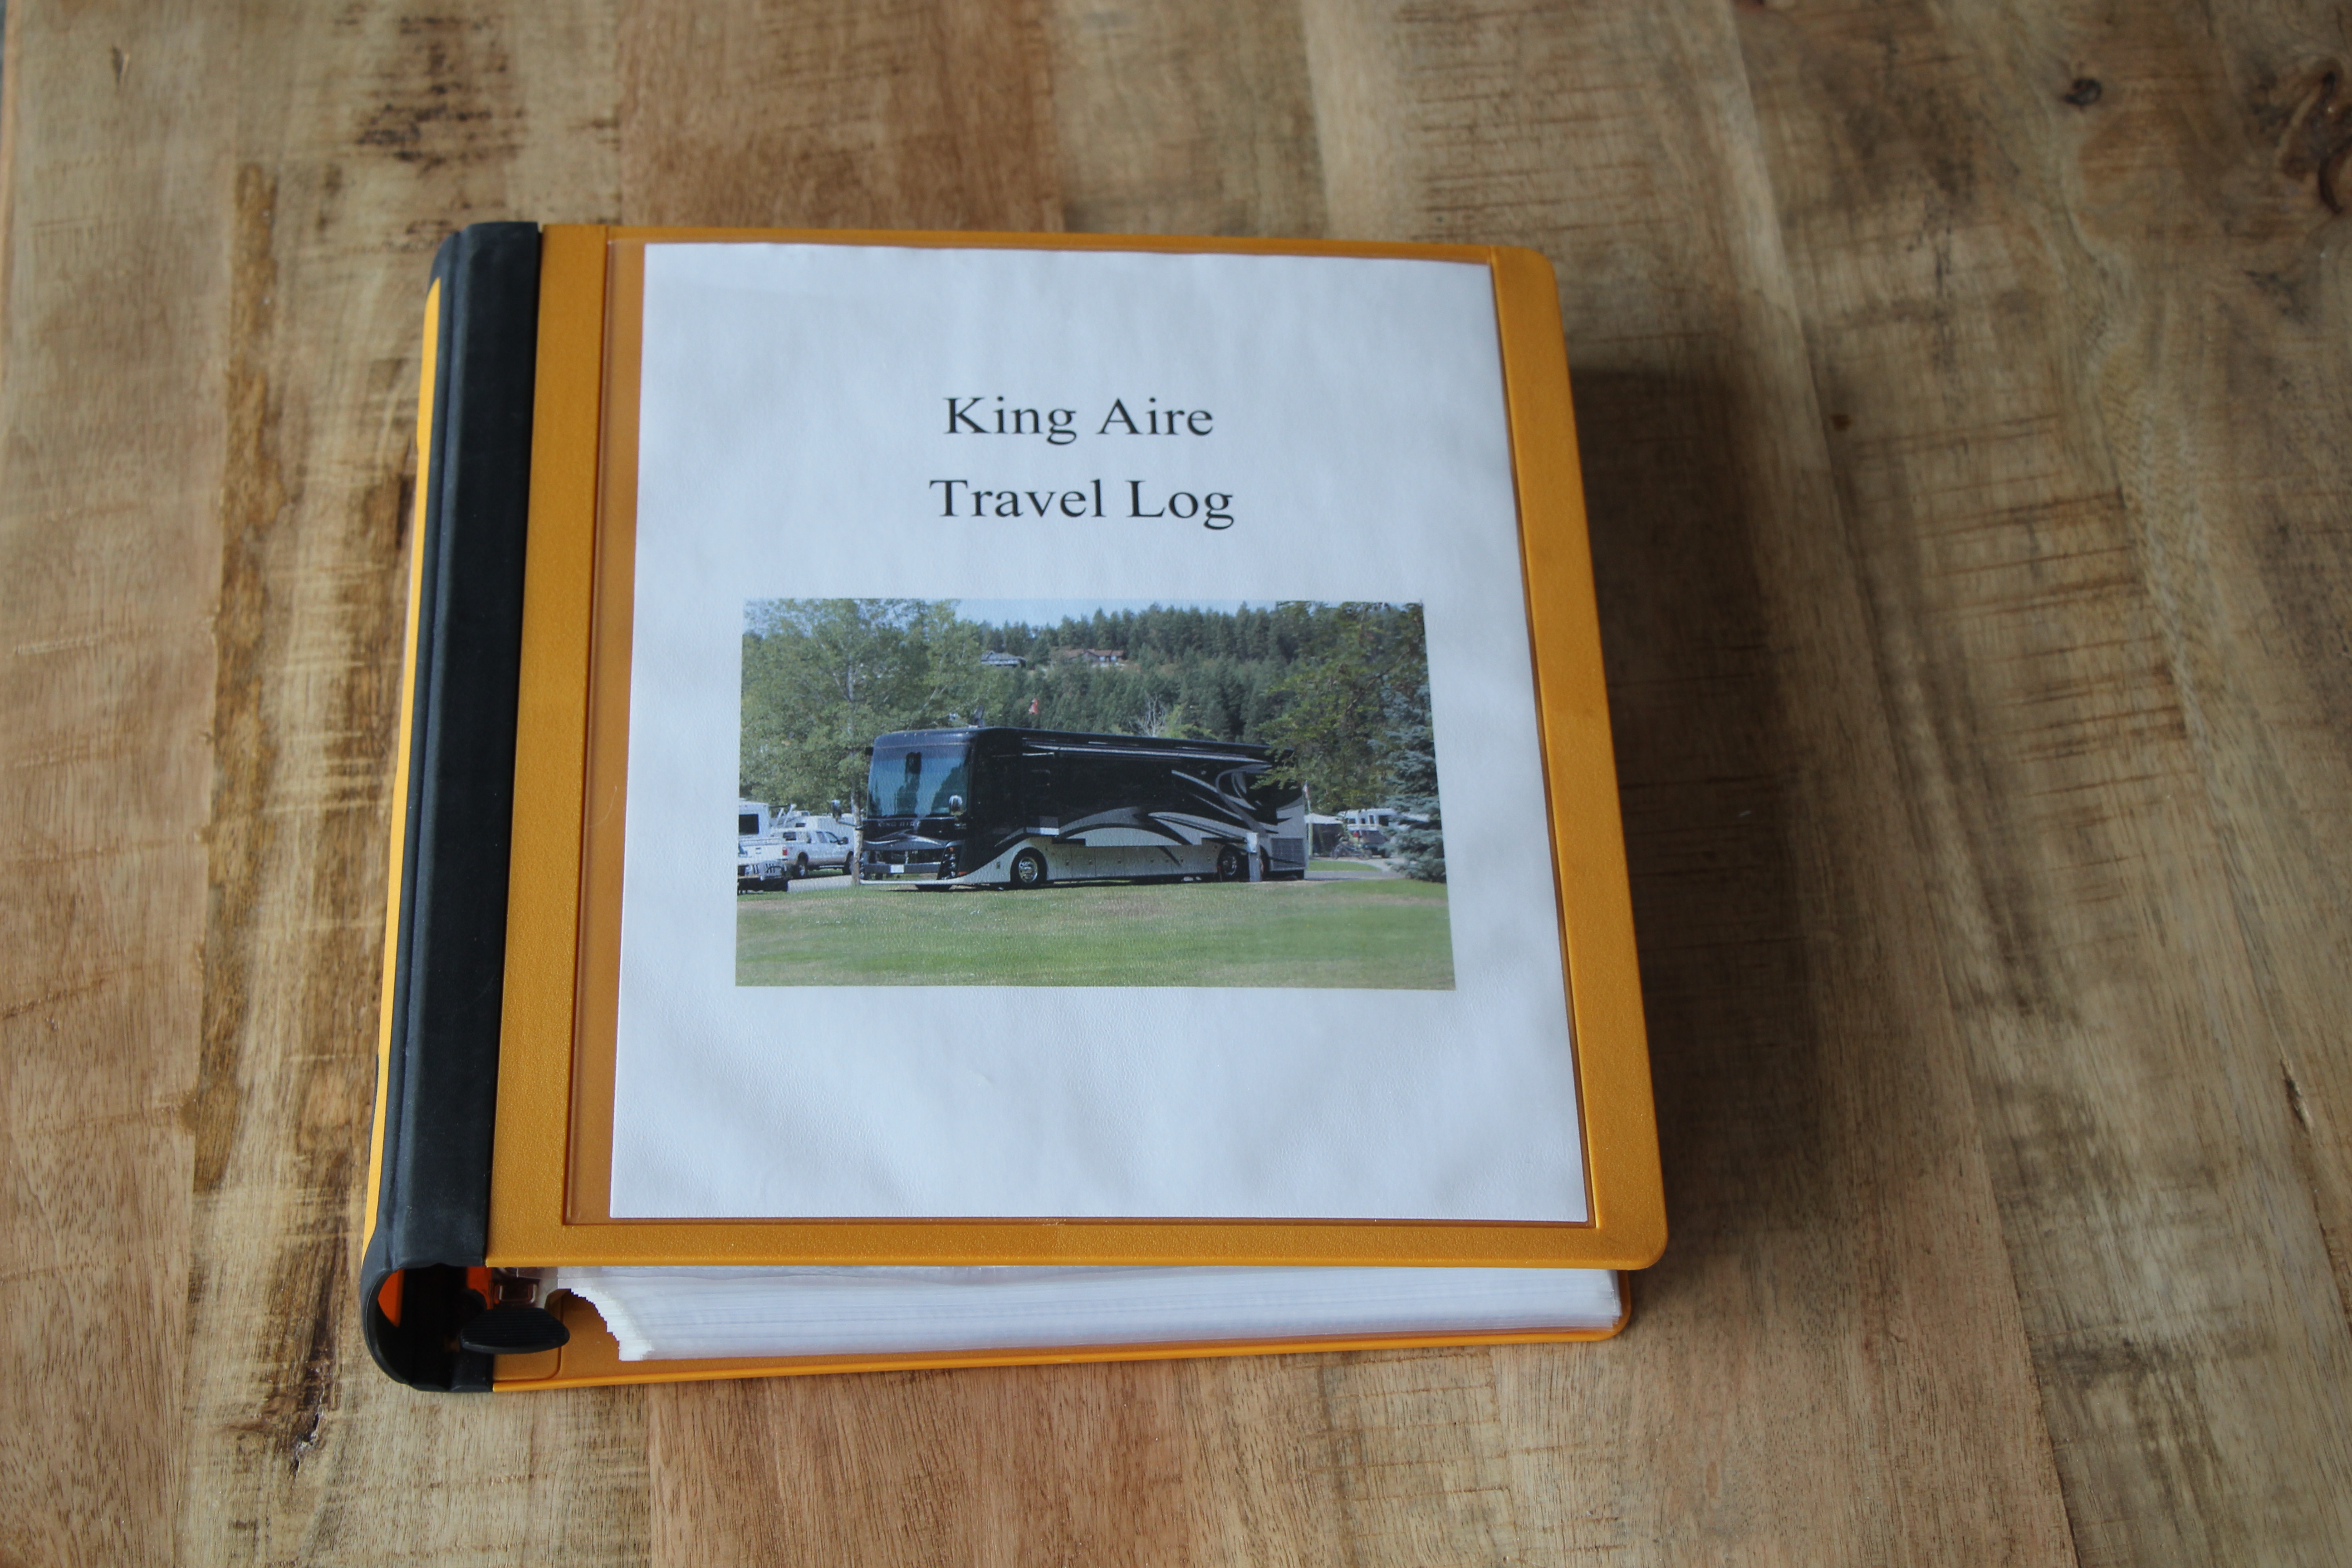 An RV log book in an orange binder.